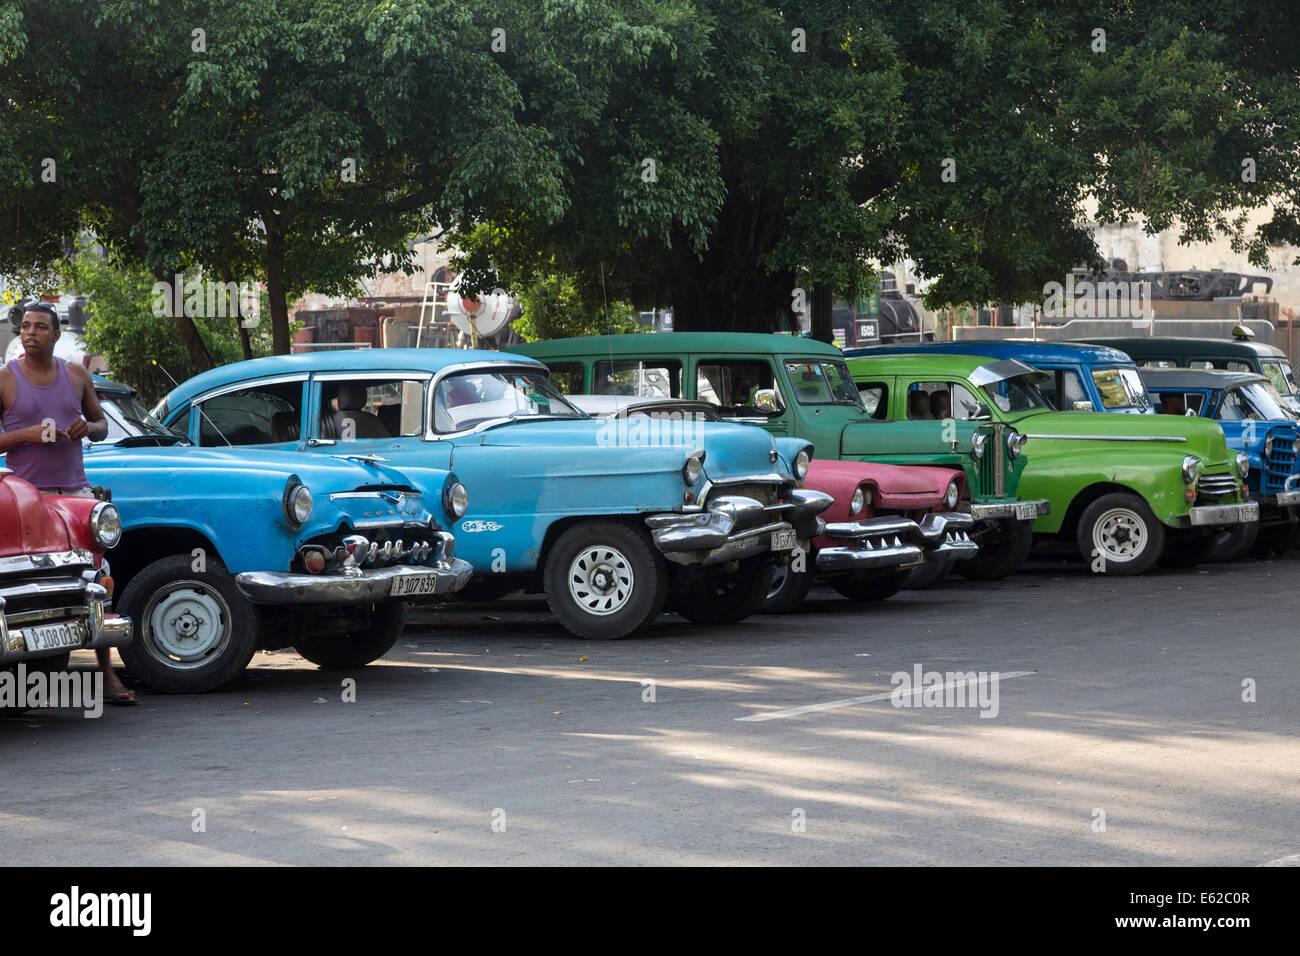 old 1950s cars, Havana, Cuba Stock Photo: 72582743 - Alamy